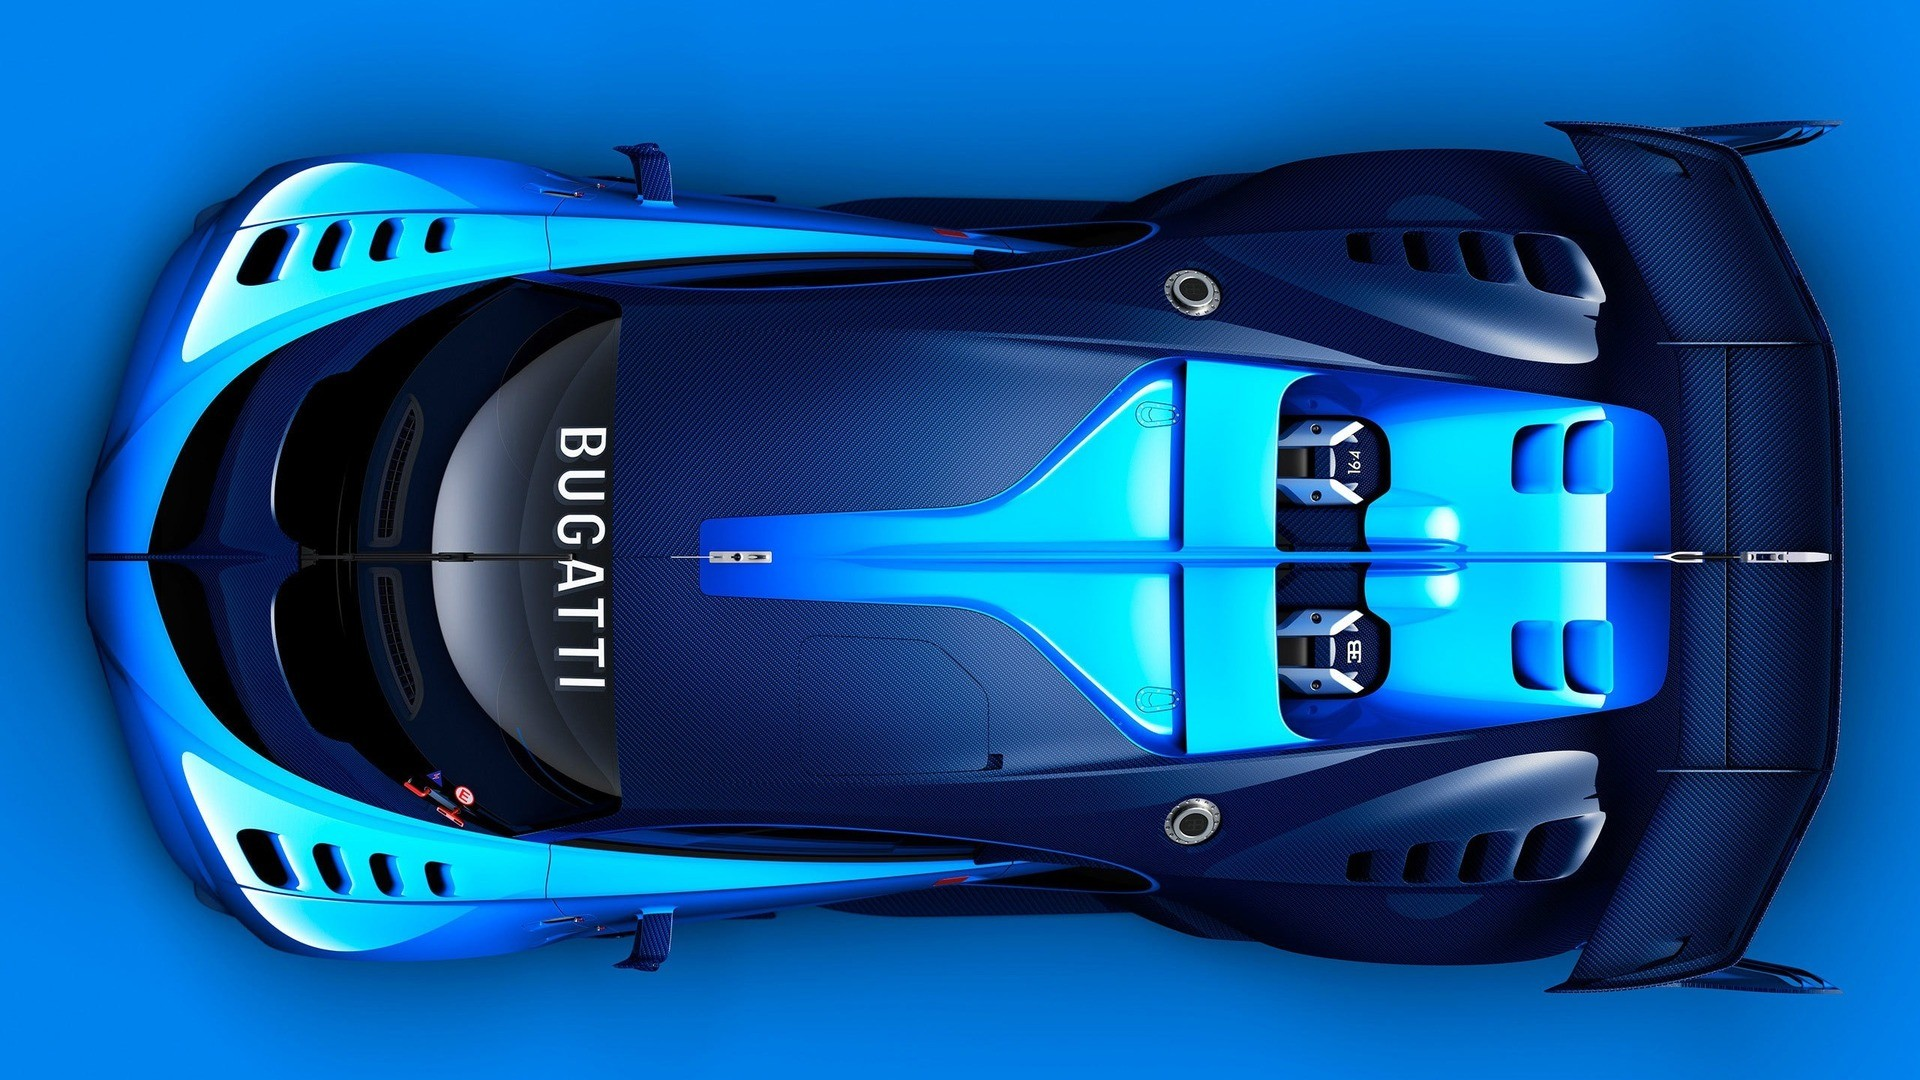 Wallpaper 3840x1080 Car Car Sports Car Concept Cars Blue Bugatti Bugatti